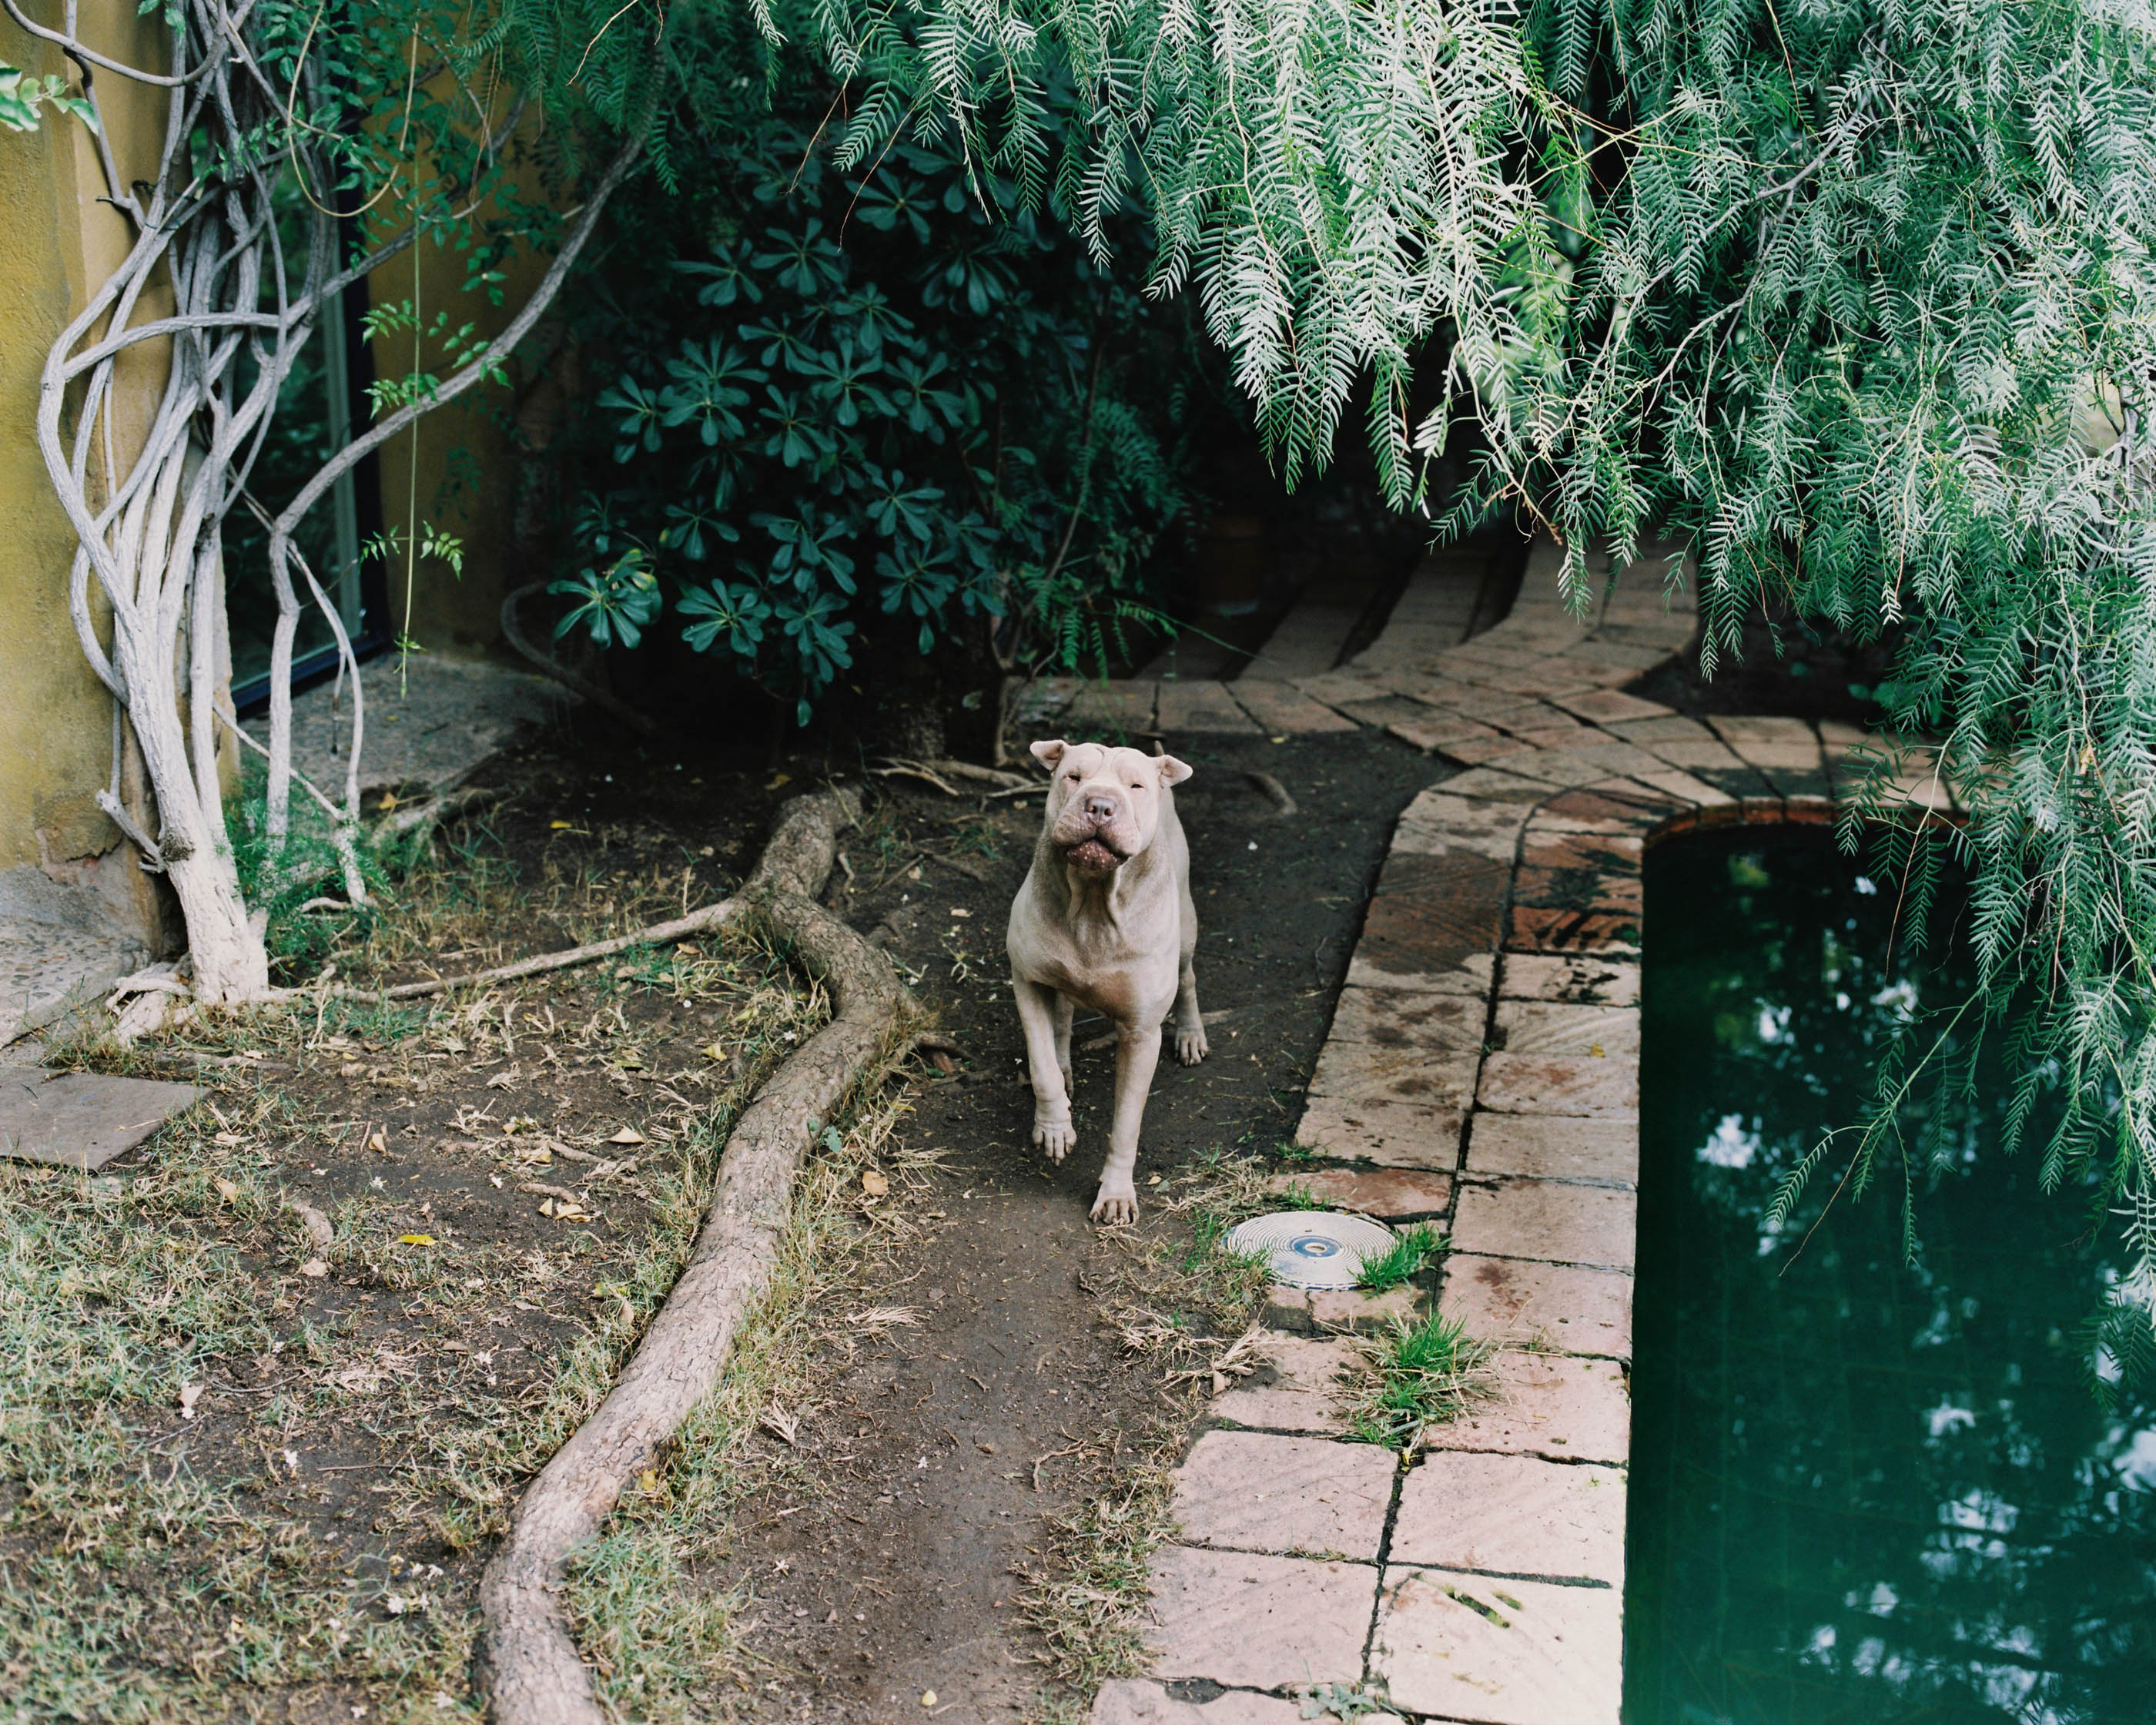 #editorial #xavier #corbero #wallstreetjournal #animals